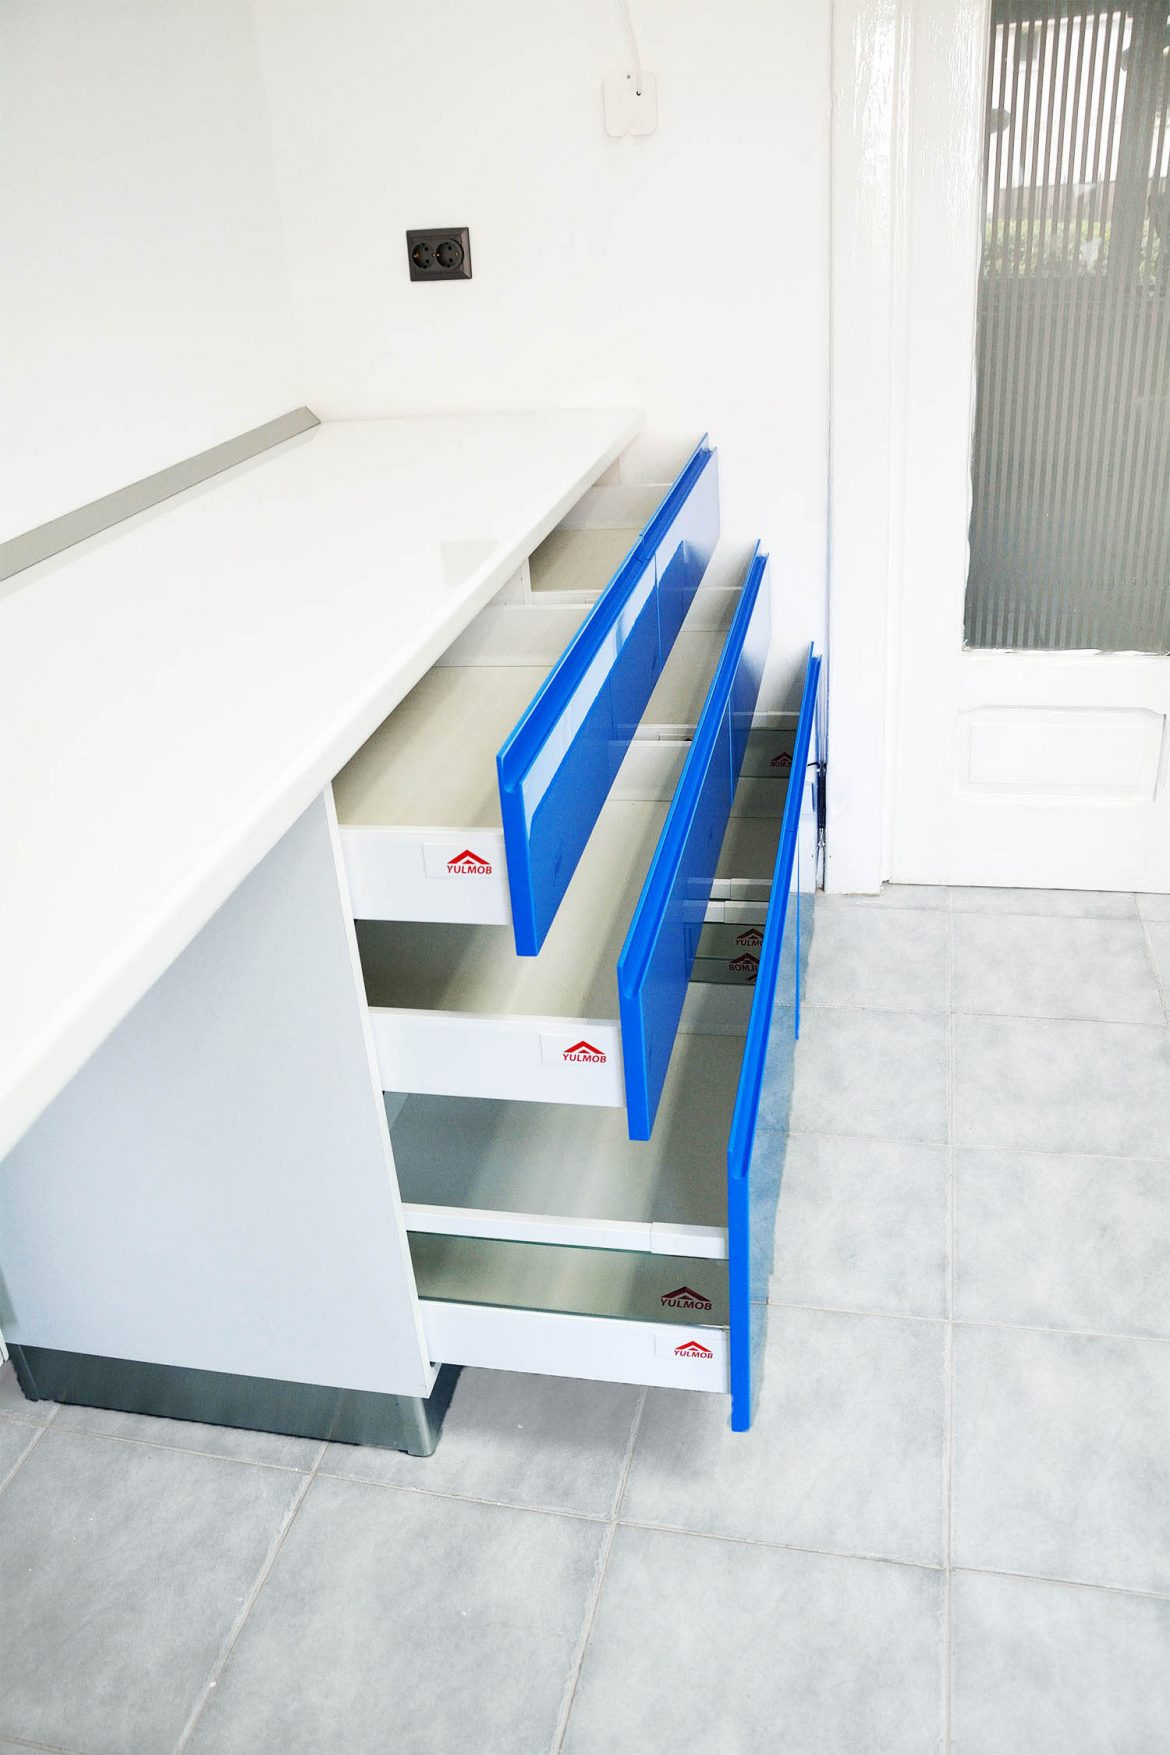 Cabinet stomatologic detali sertare cu silentioase antaro Blum fete din MDF vopsit blue ocean lucios frezare maner RAL 5002 copy 1